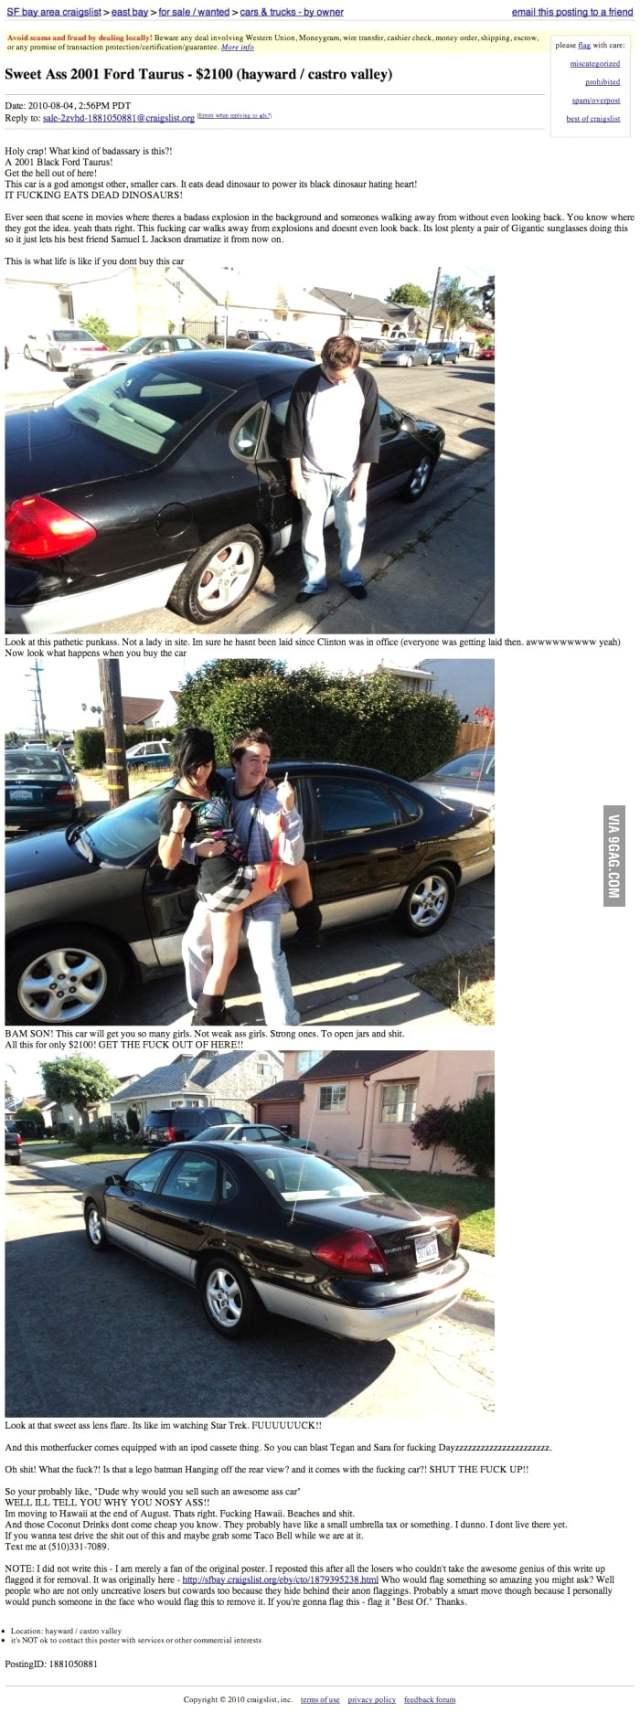 Best Craigslist Ad For A Car, Ever. - 19GAG